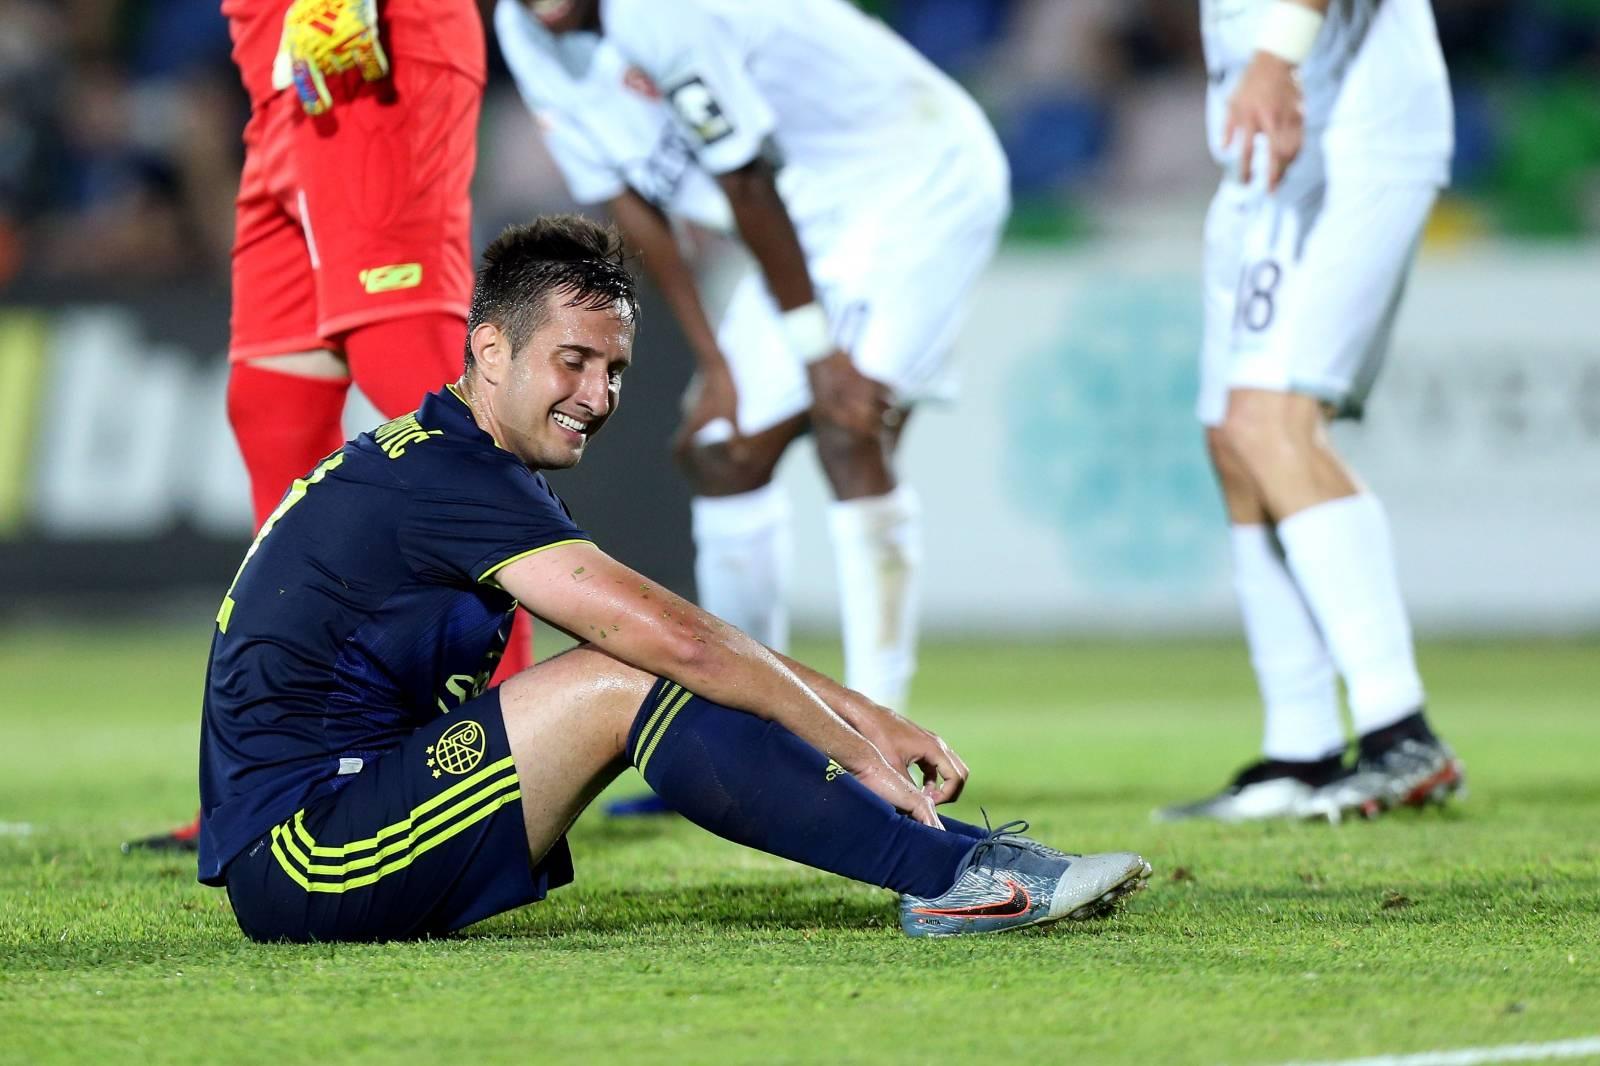 Tbilisi: Prva utakmica 2. pretkola kvalifikacija UEFA Lige prvaka, FC Saburtalo - GNK Dinamo